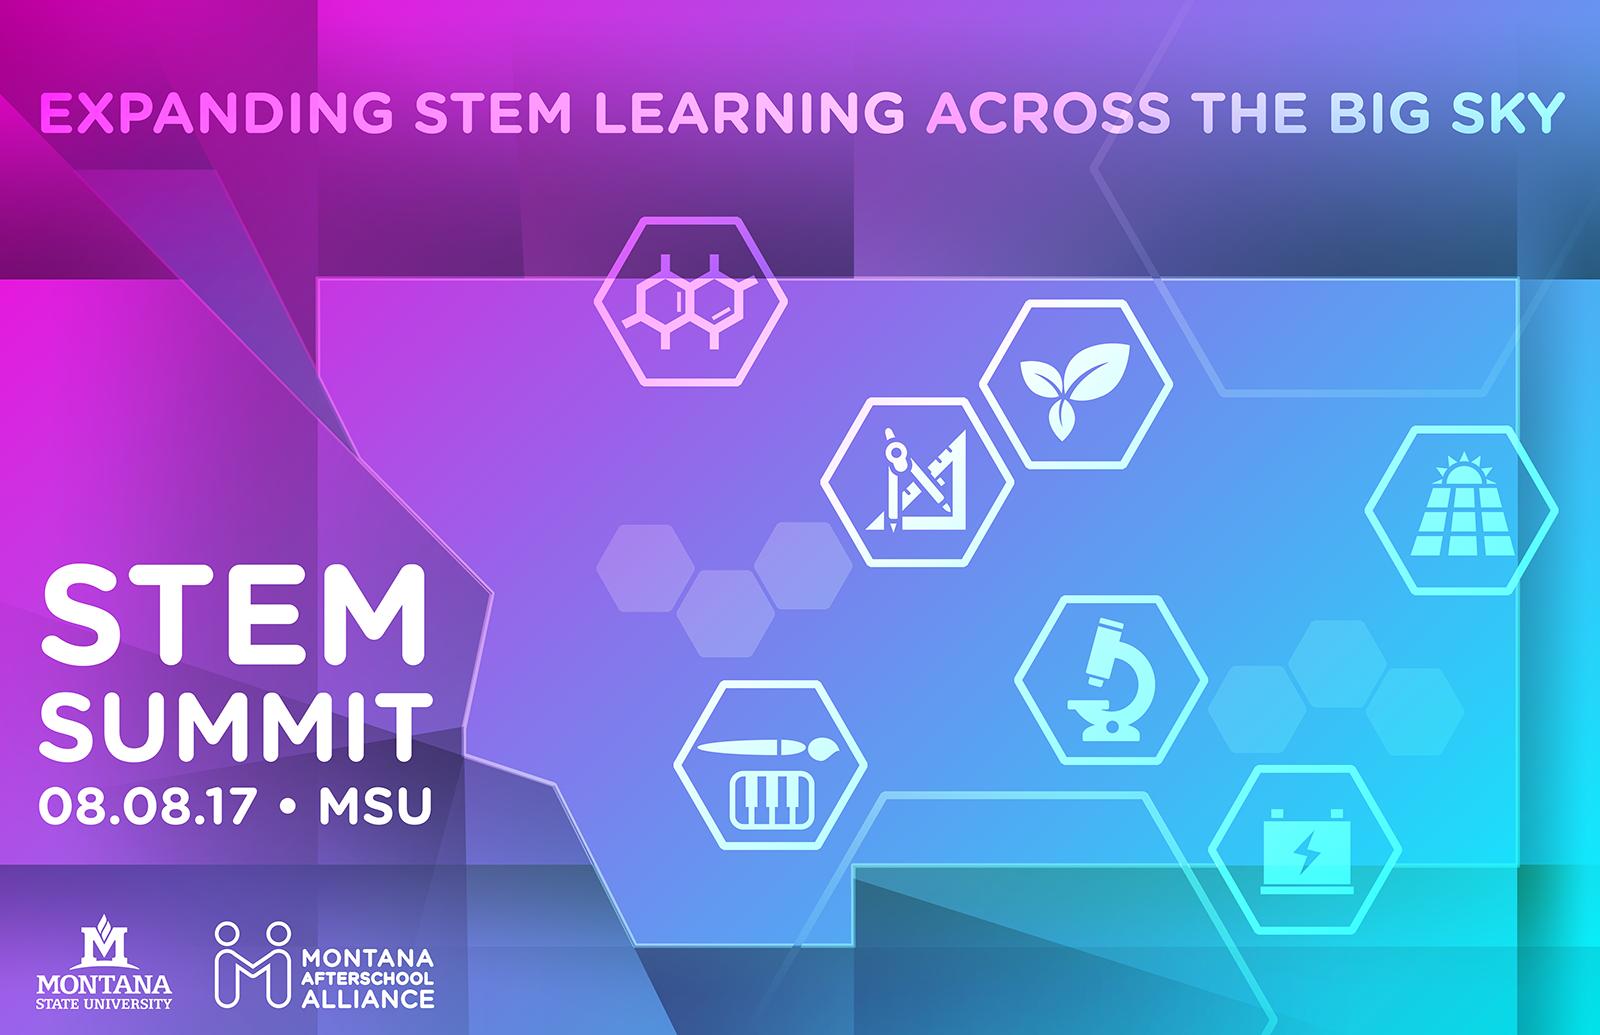 STEM Summit